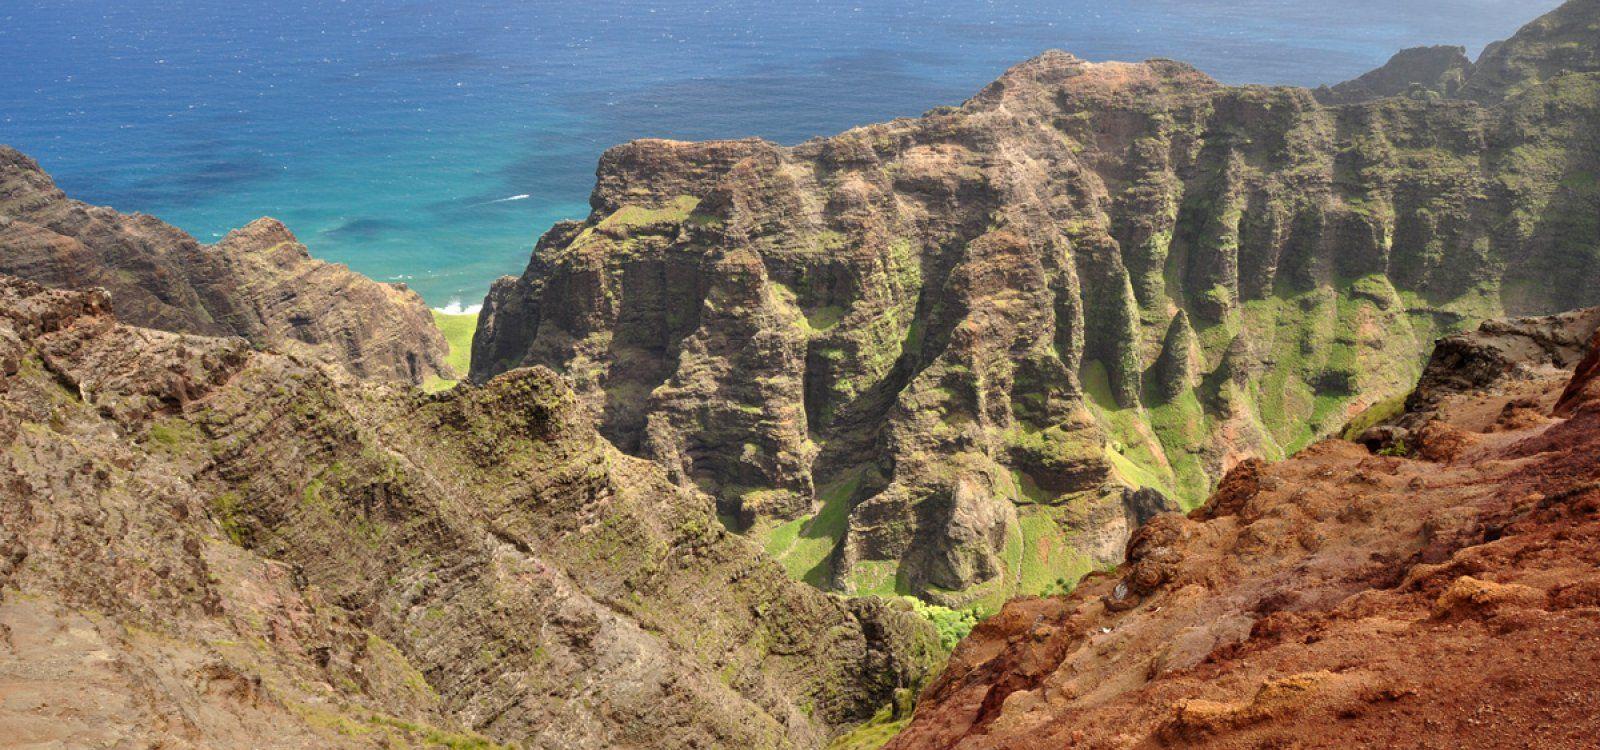 Nualolo Trail Kauai hawaii, Kauai, Trail